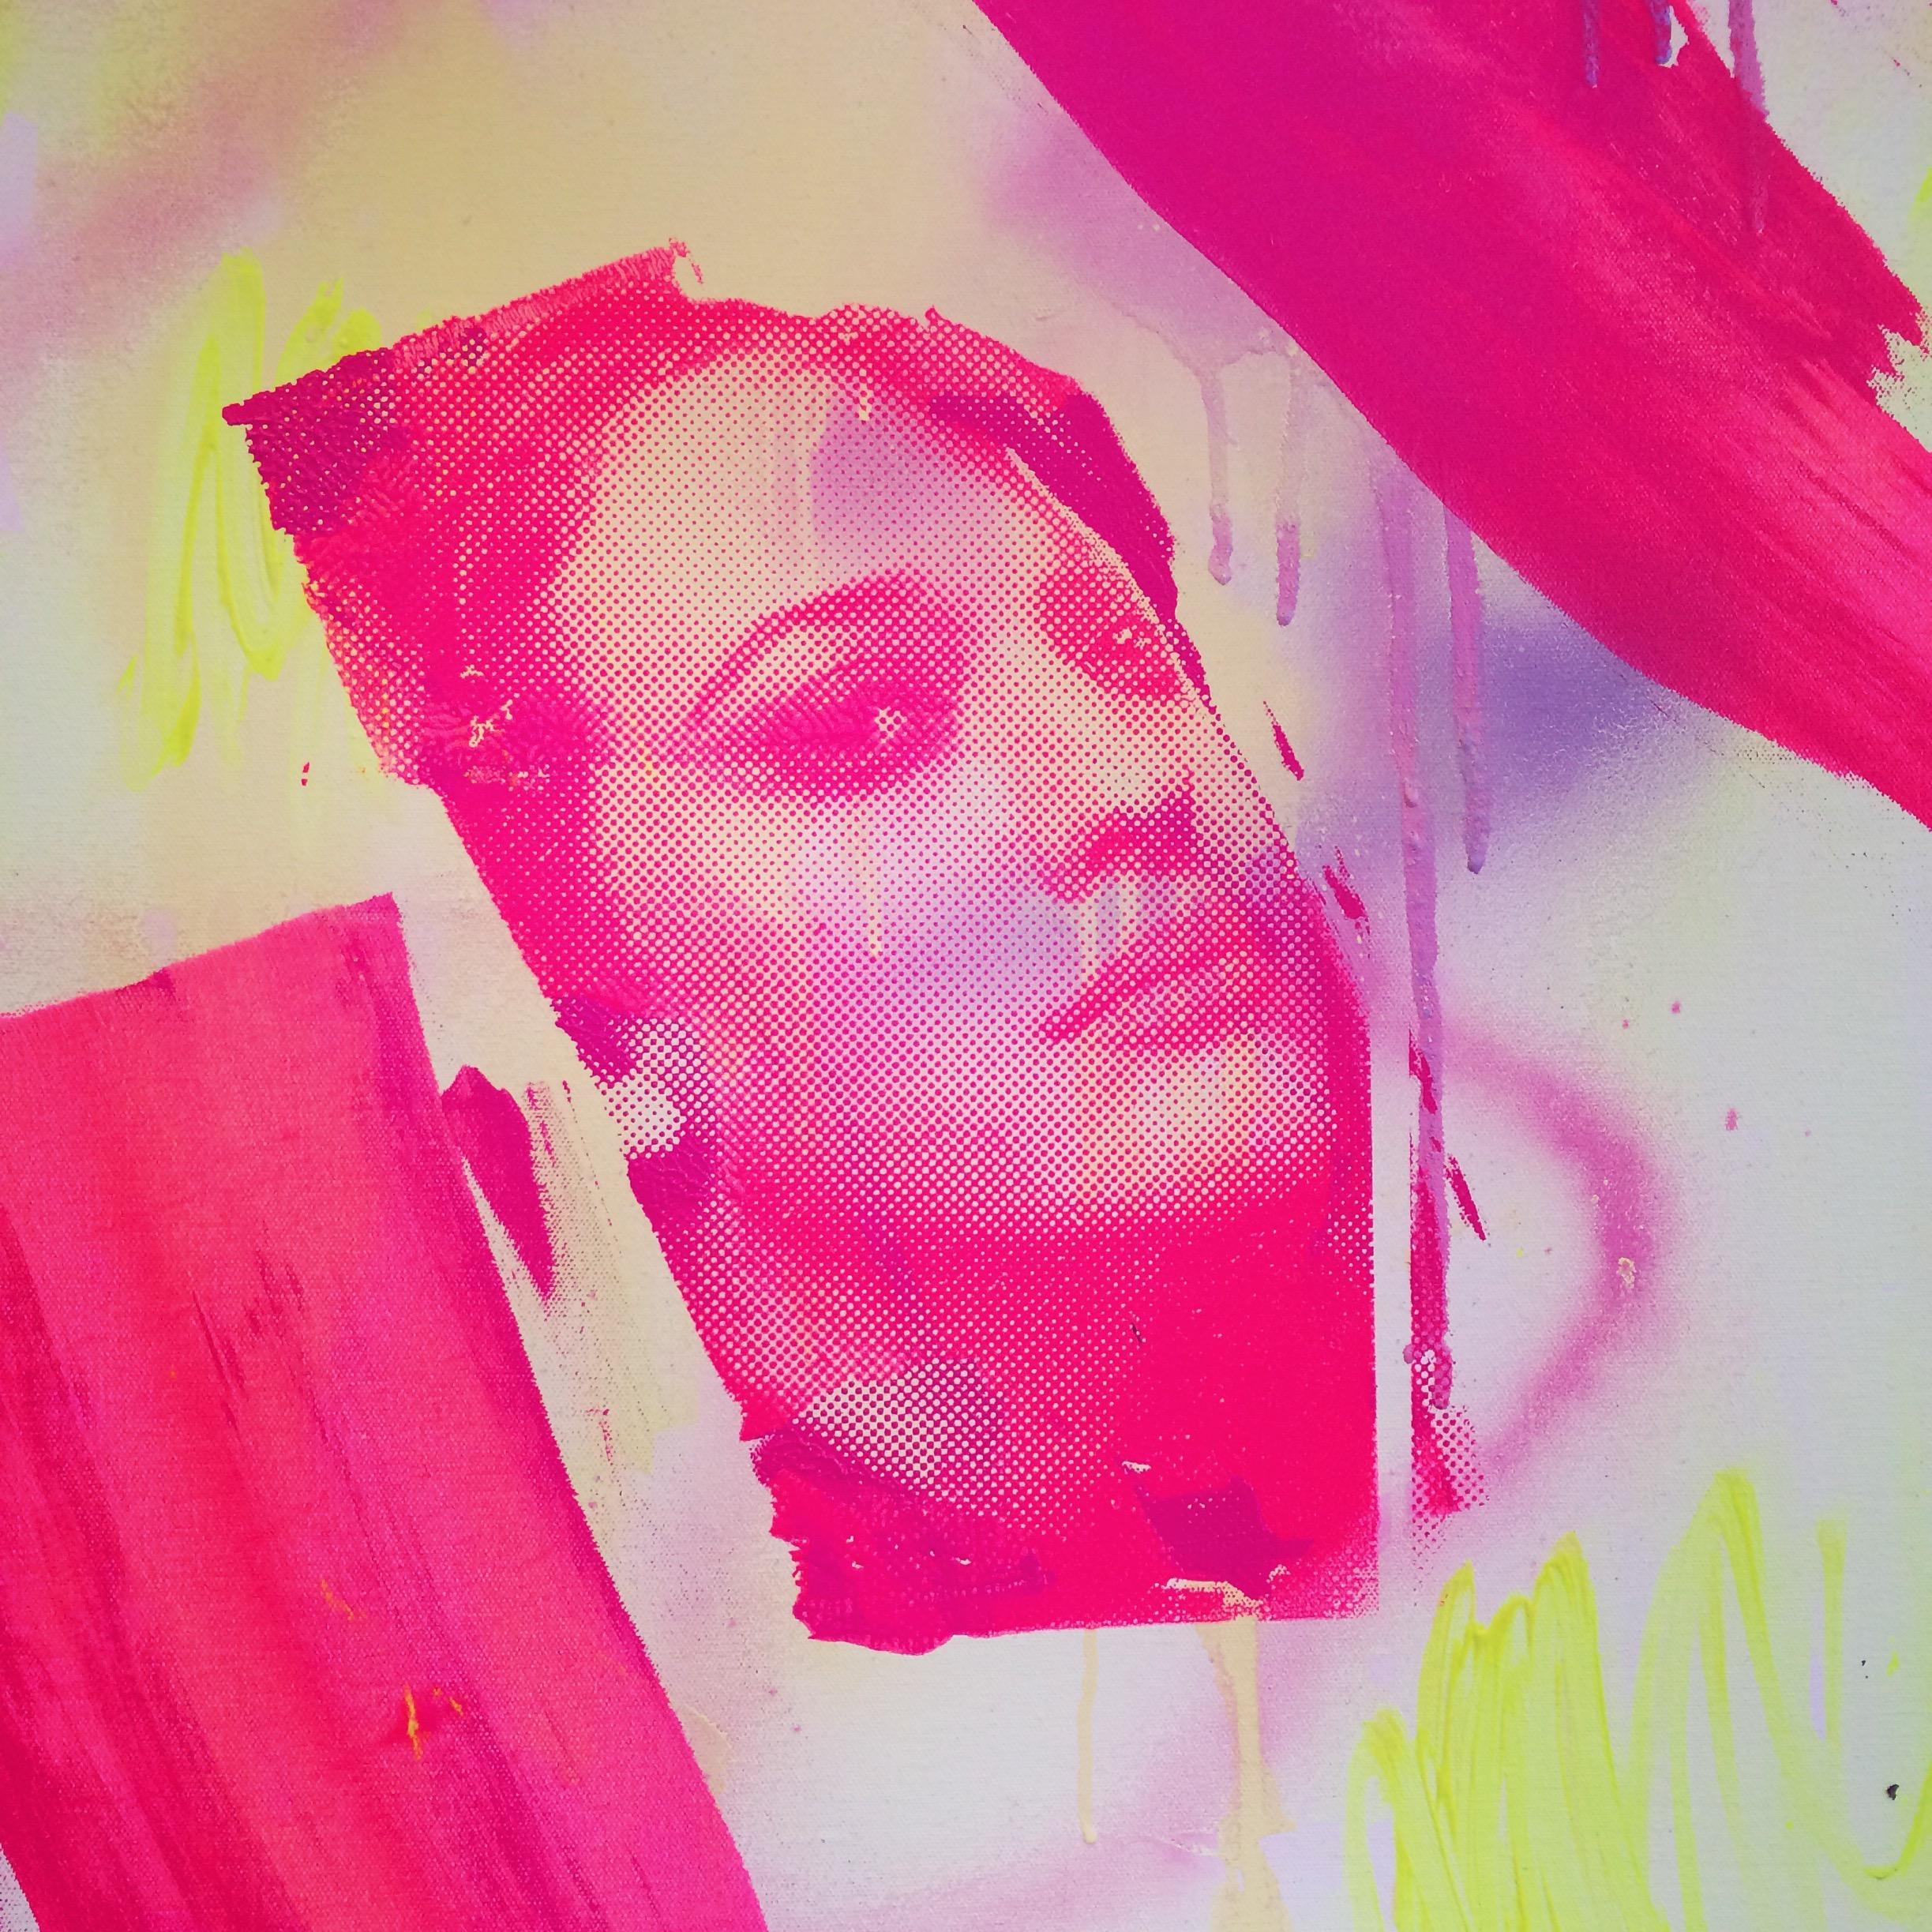 Fash-on, Fash-off, spray paint, acyrlic and silk screen on canvas, 70 x 90 cm